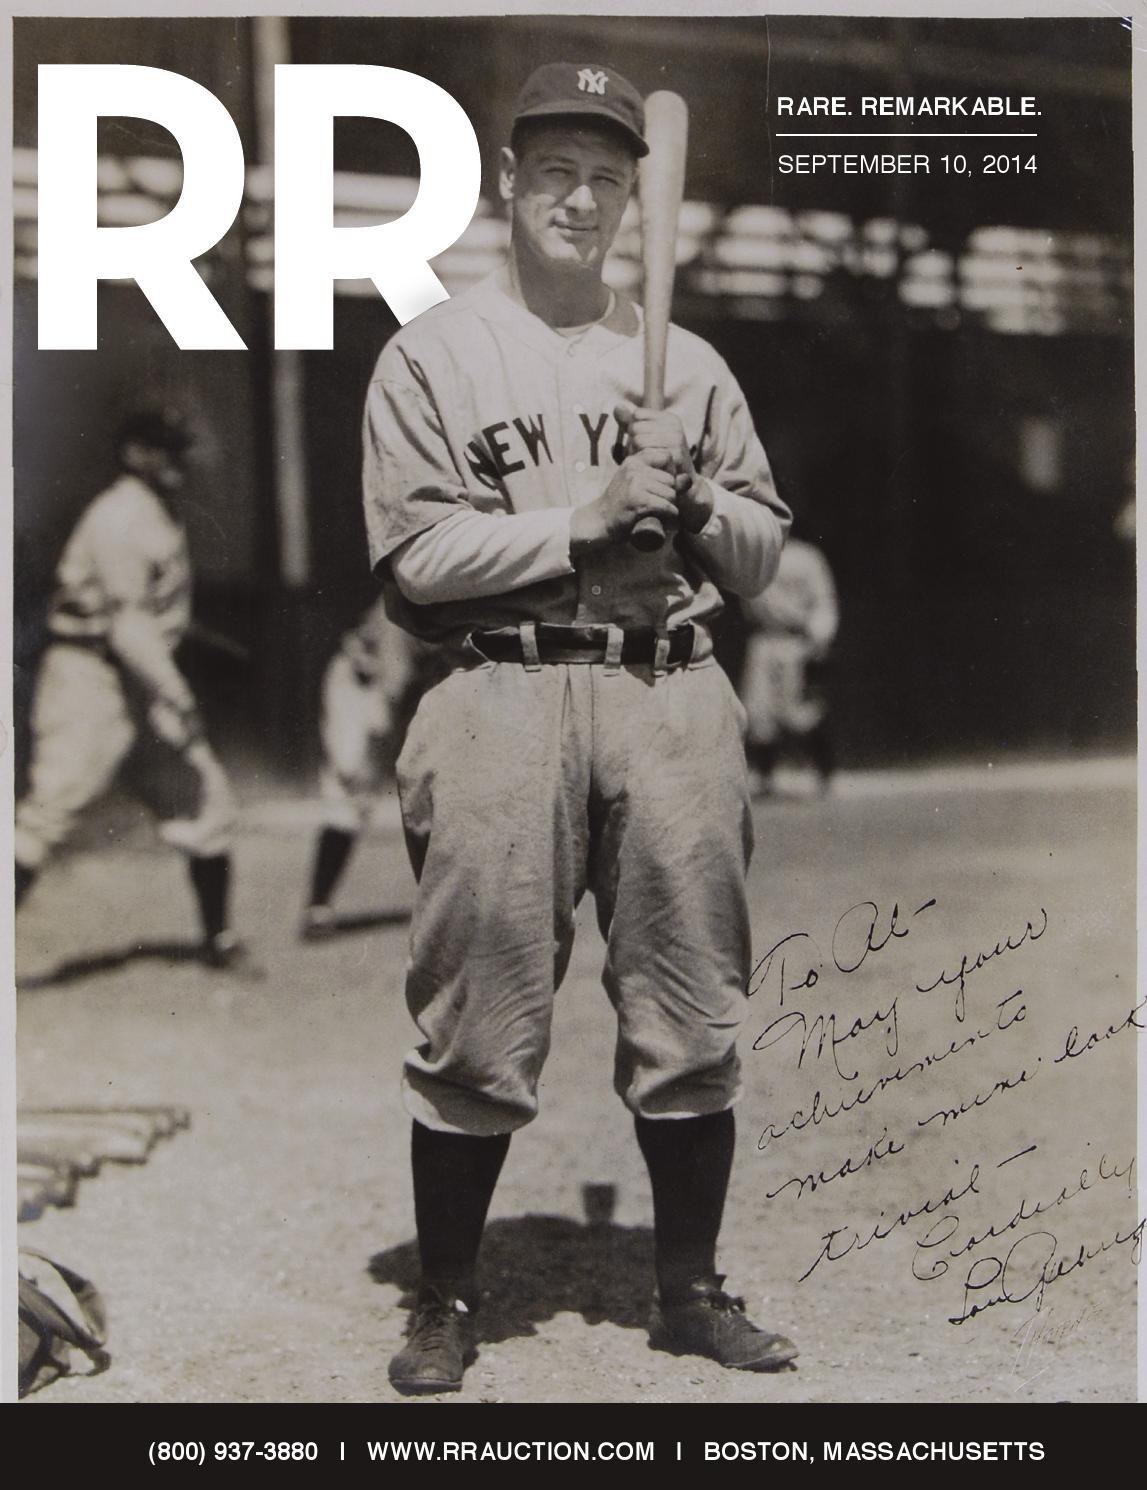 Rr Autograph Auctions Consignment Agreement: RR Auction: September 2014 Rare Manuscript, Document, And